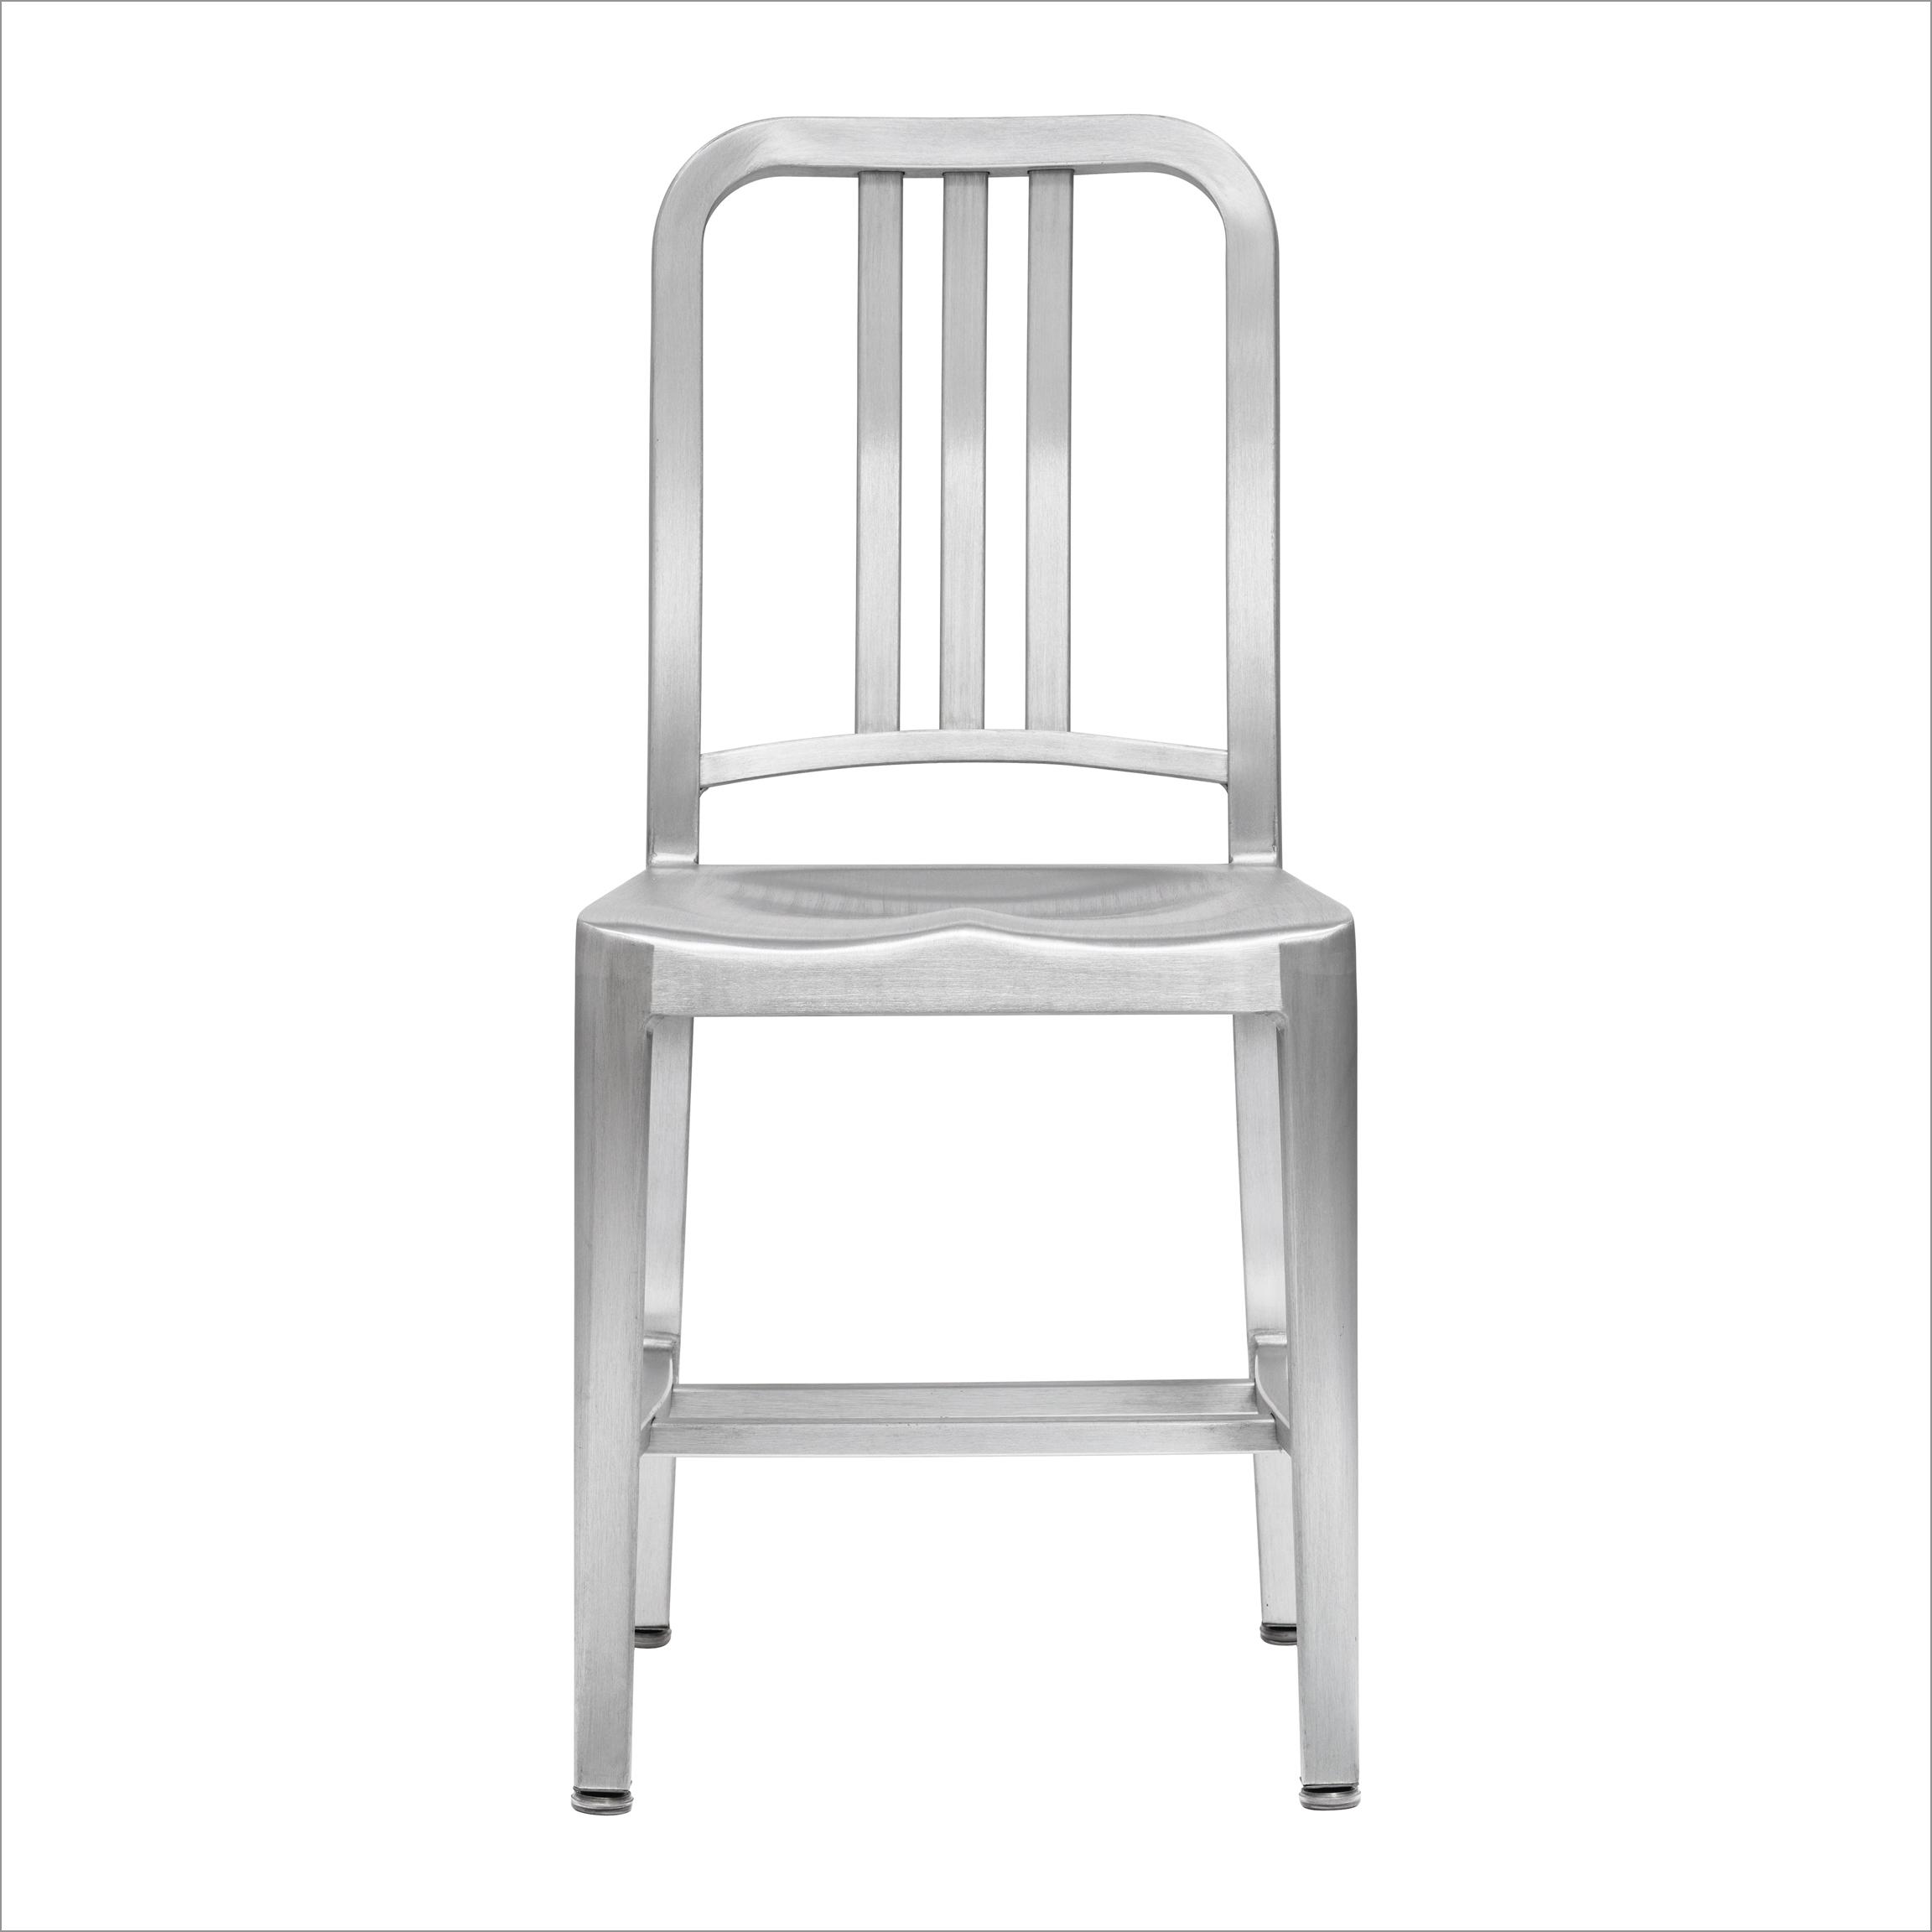 Emeco-1006-Navy-Chair.jpg